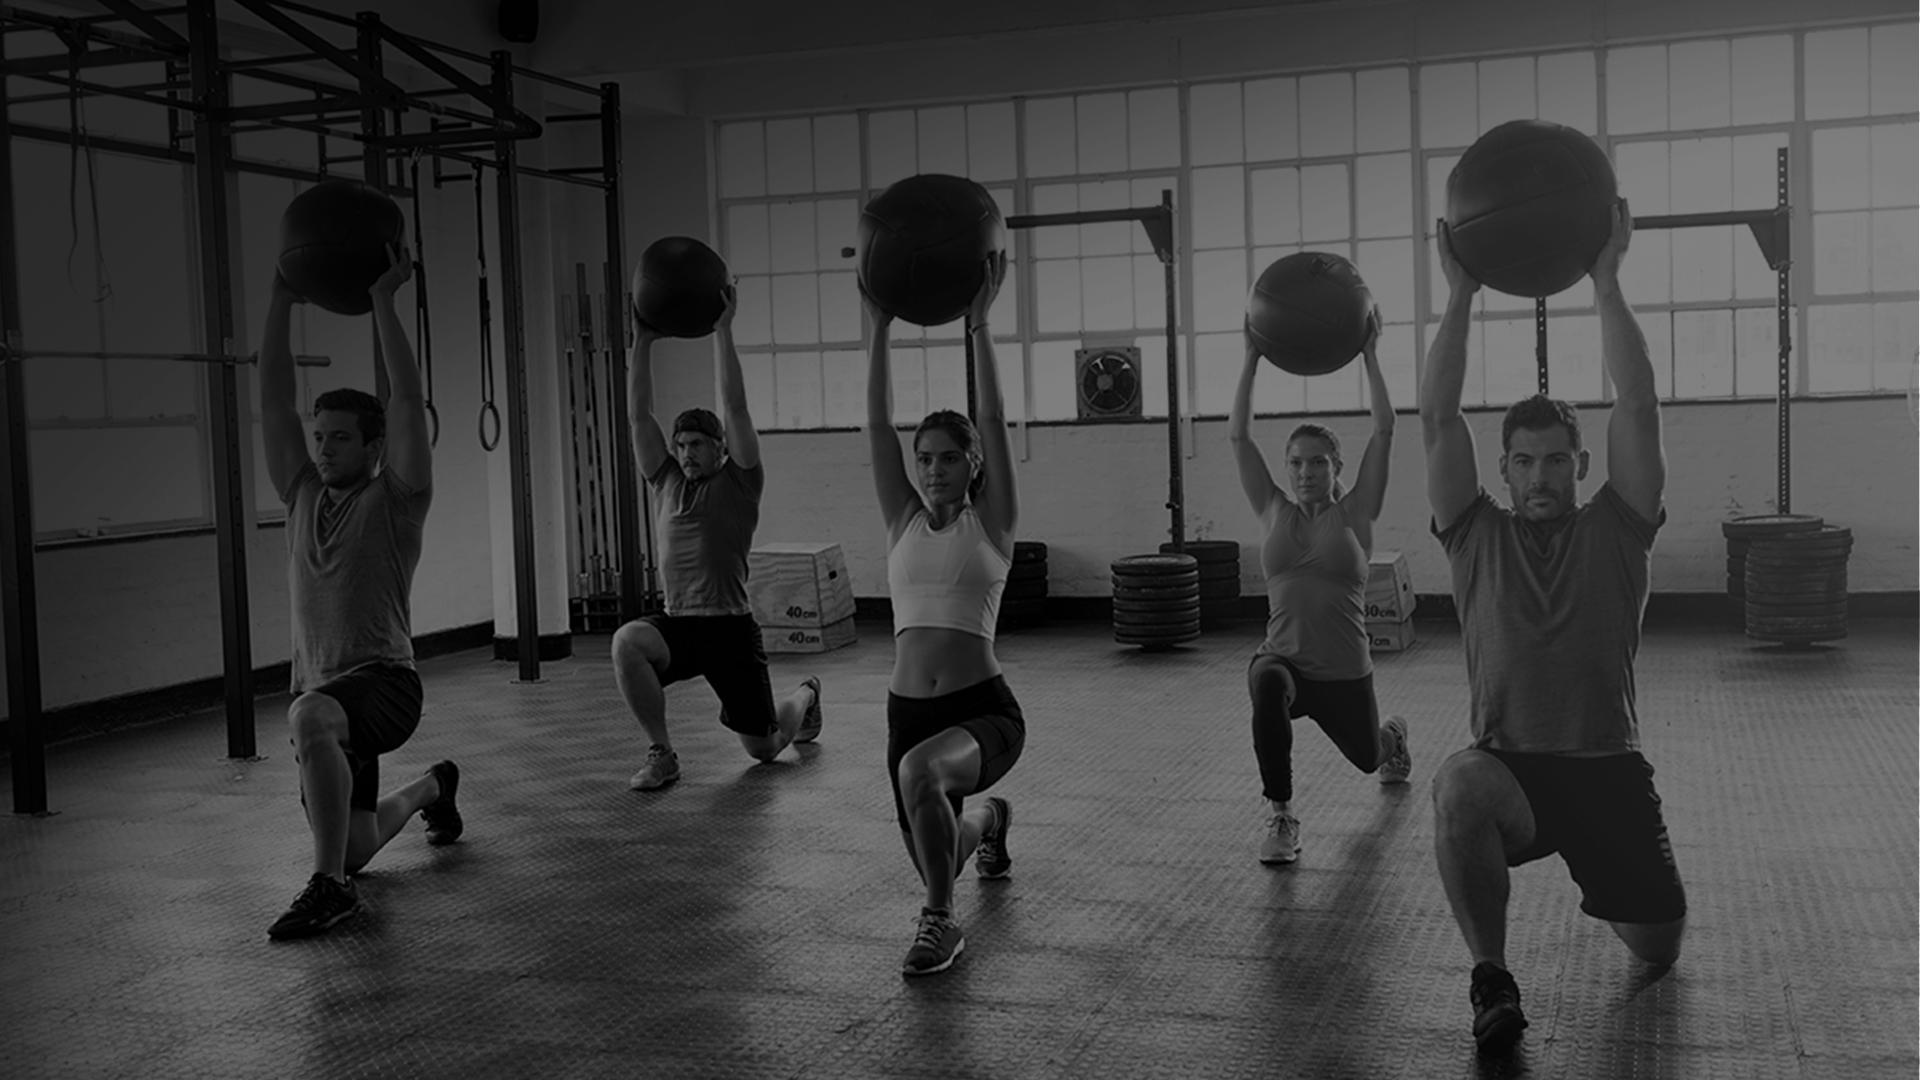 MP Group Exercise Trainer® seminar banner by MPBalatsinos